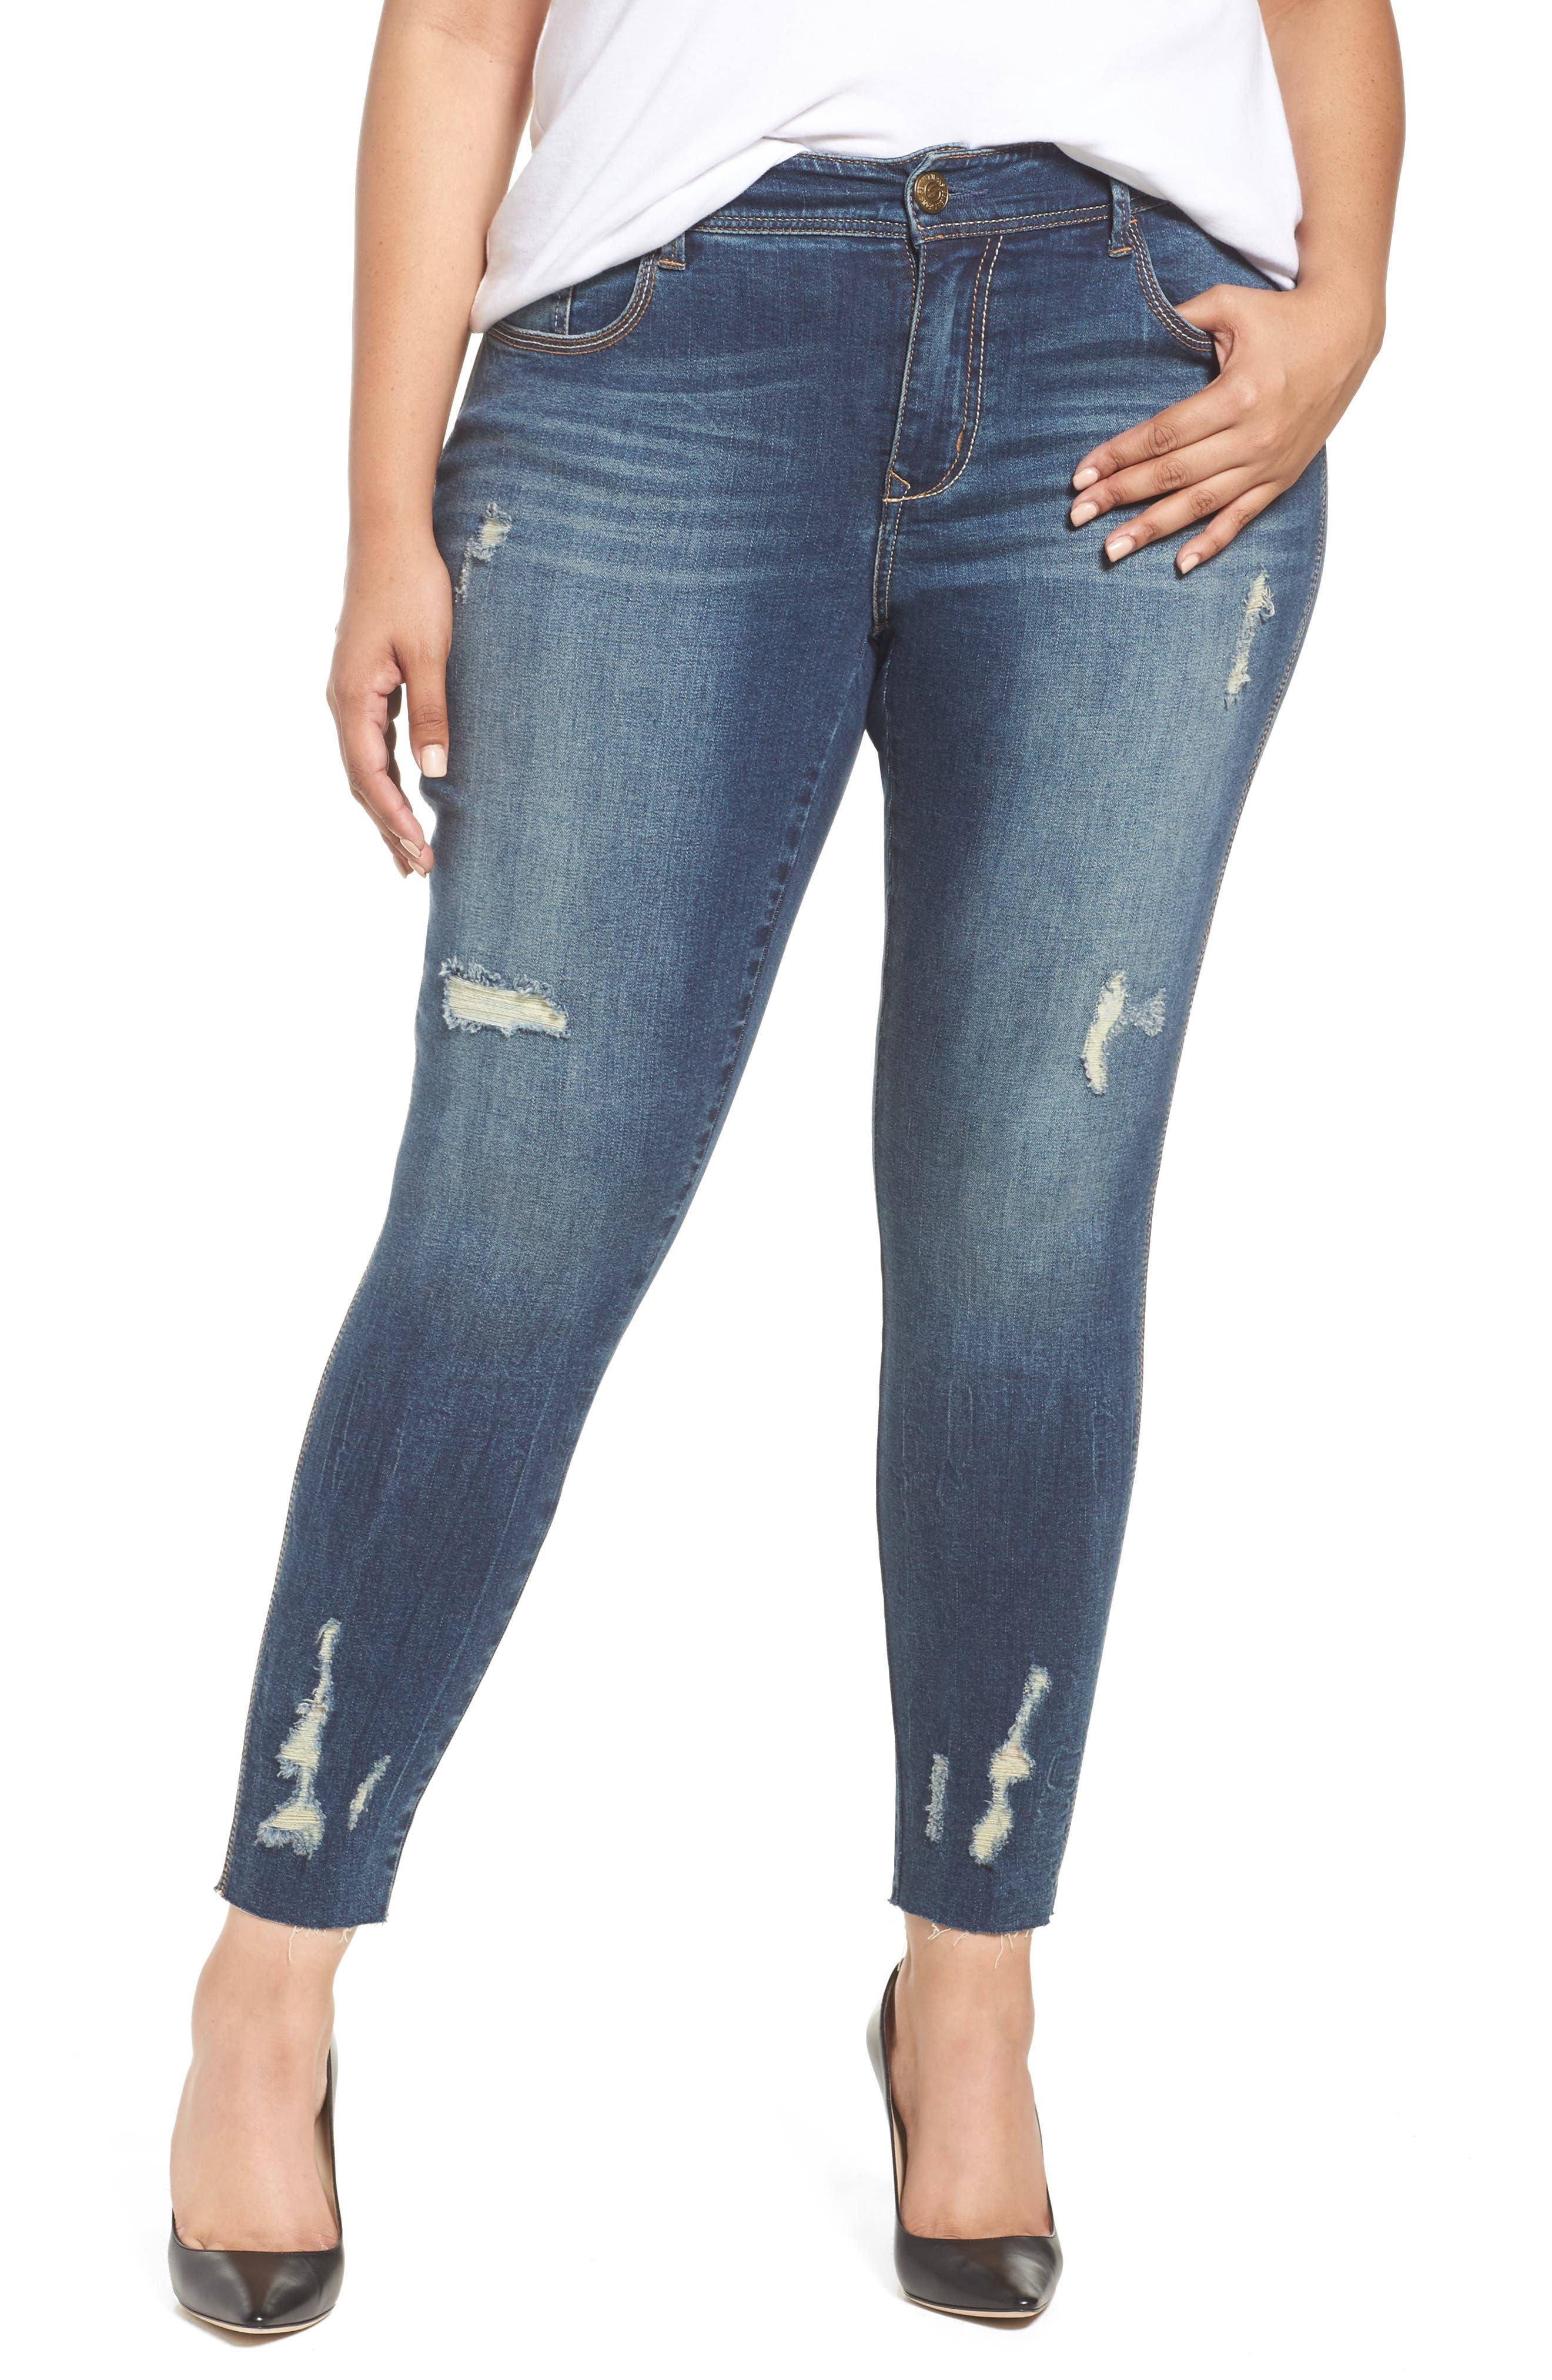 Alternate Image 1 Selected - Seven7 Distressed Raw Hem Skinny Jeans (Melbourne) (Plus Size)